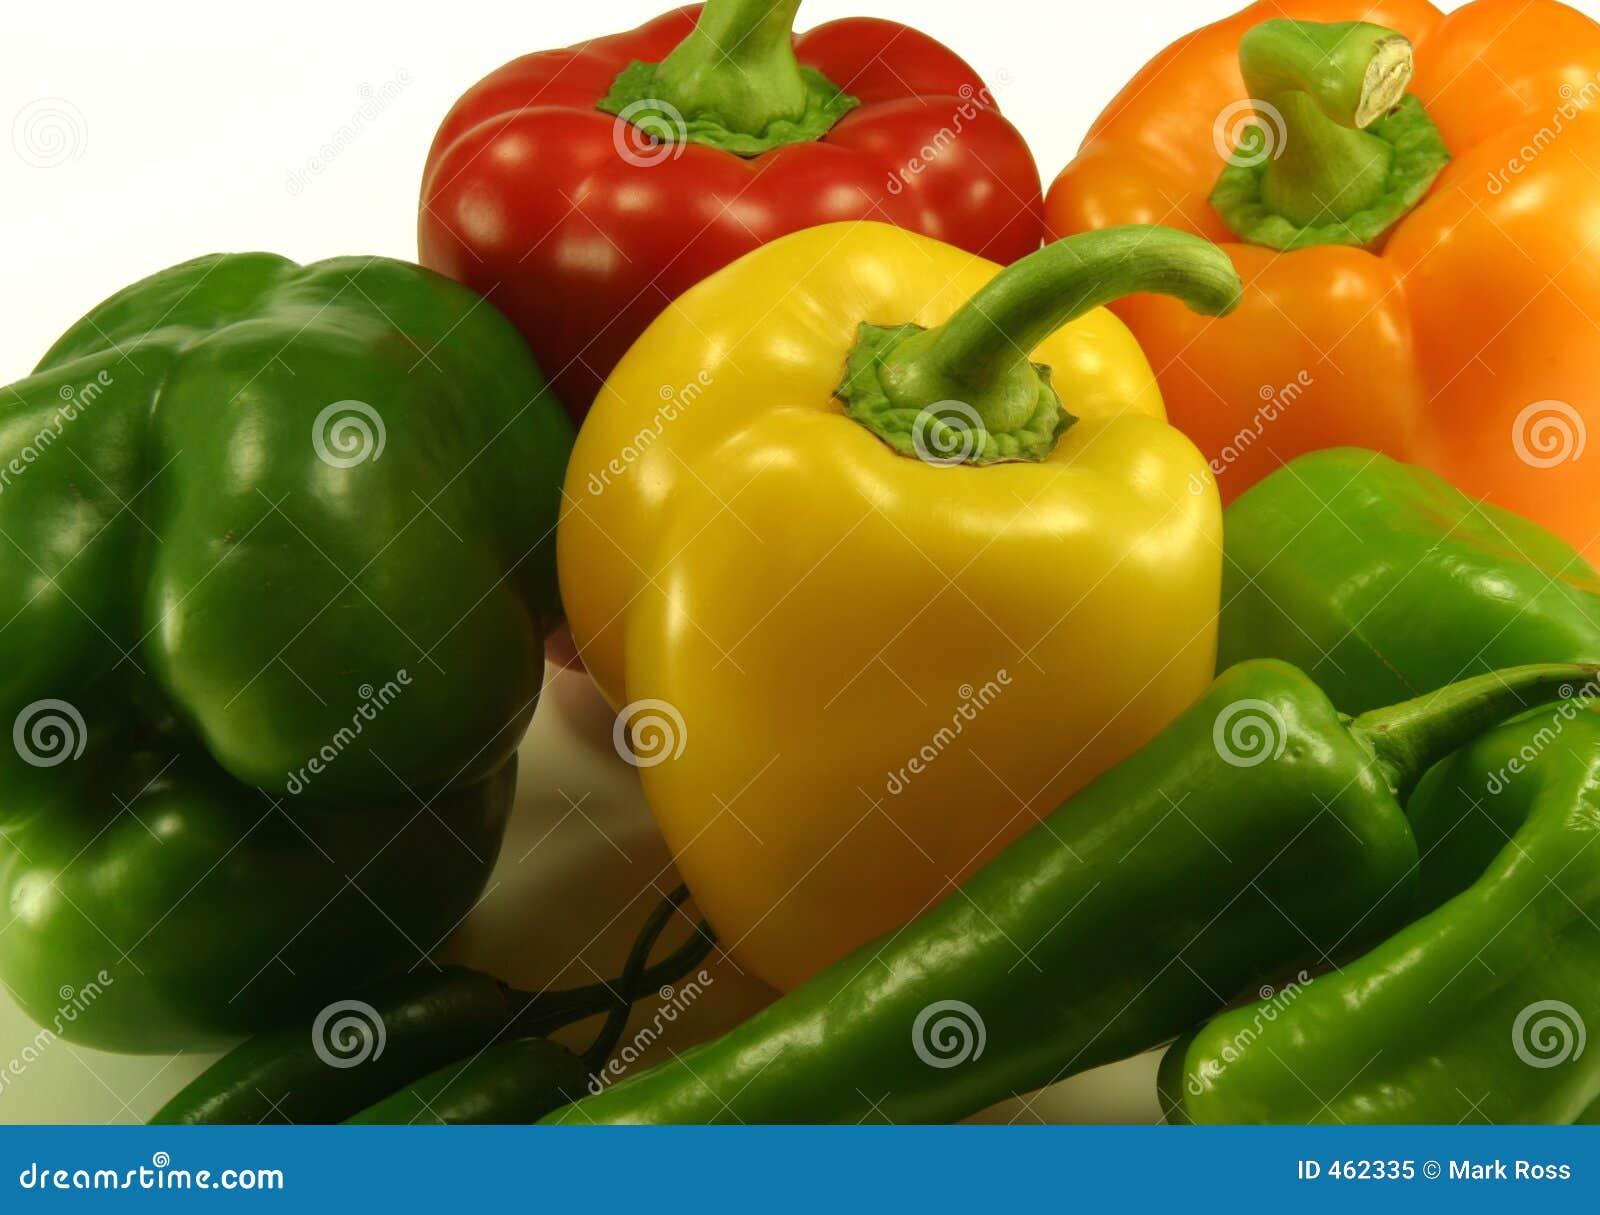 Assorted Pepper Plants